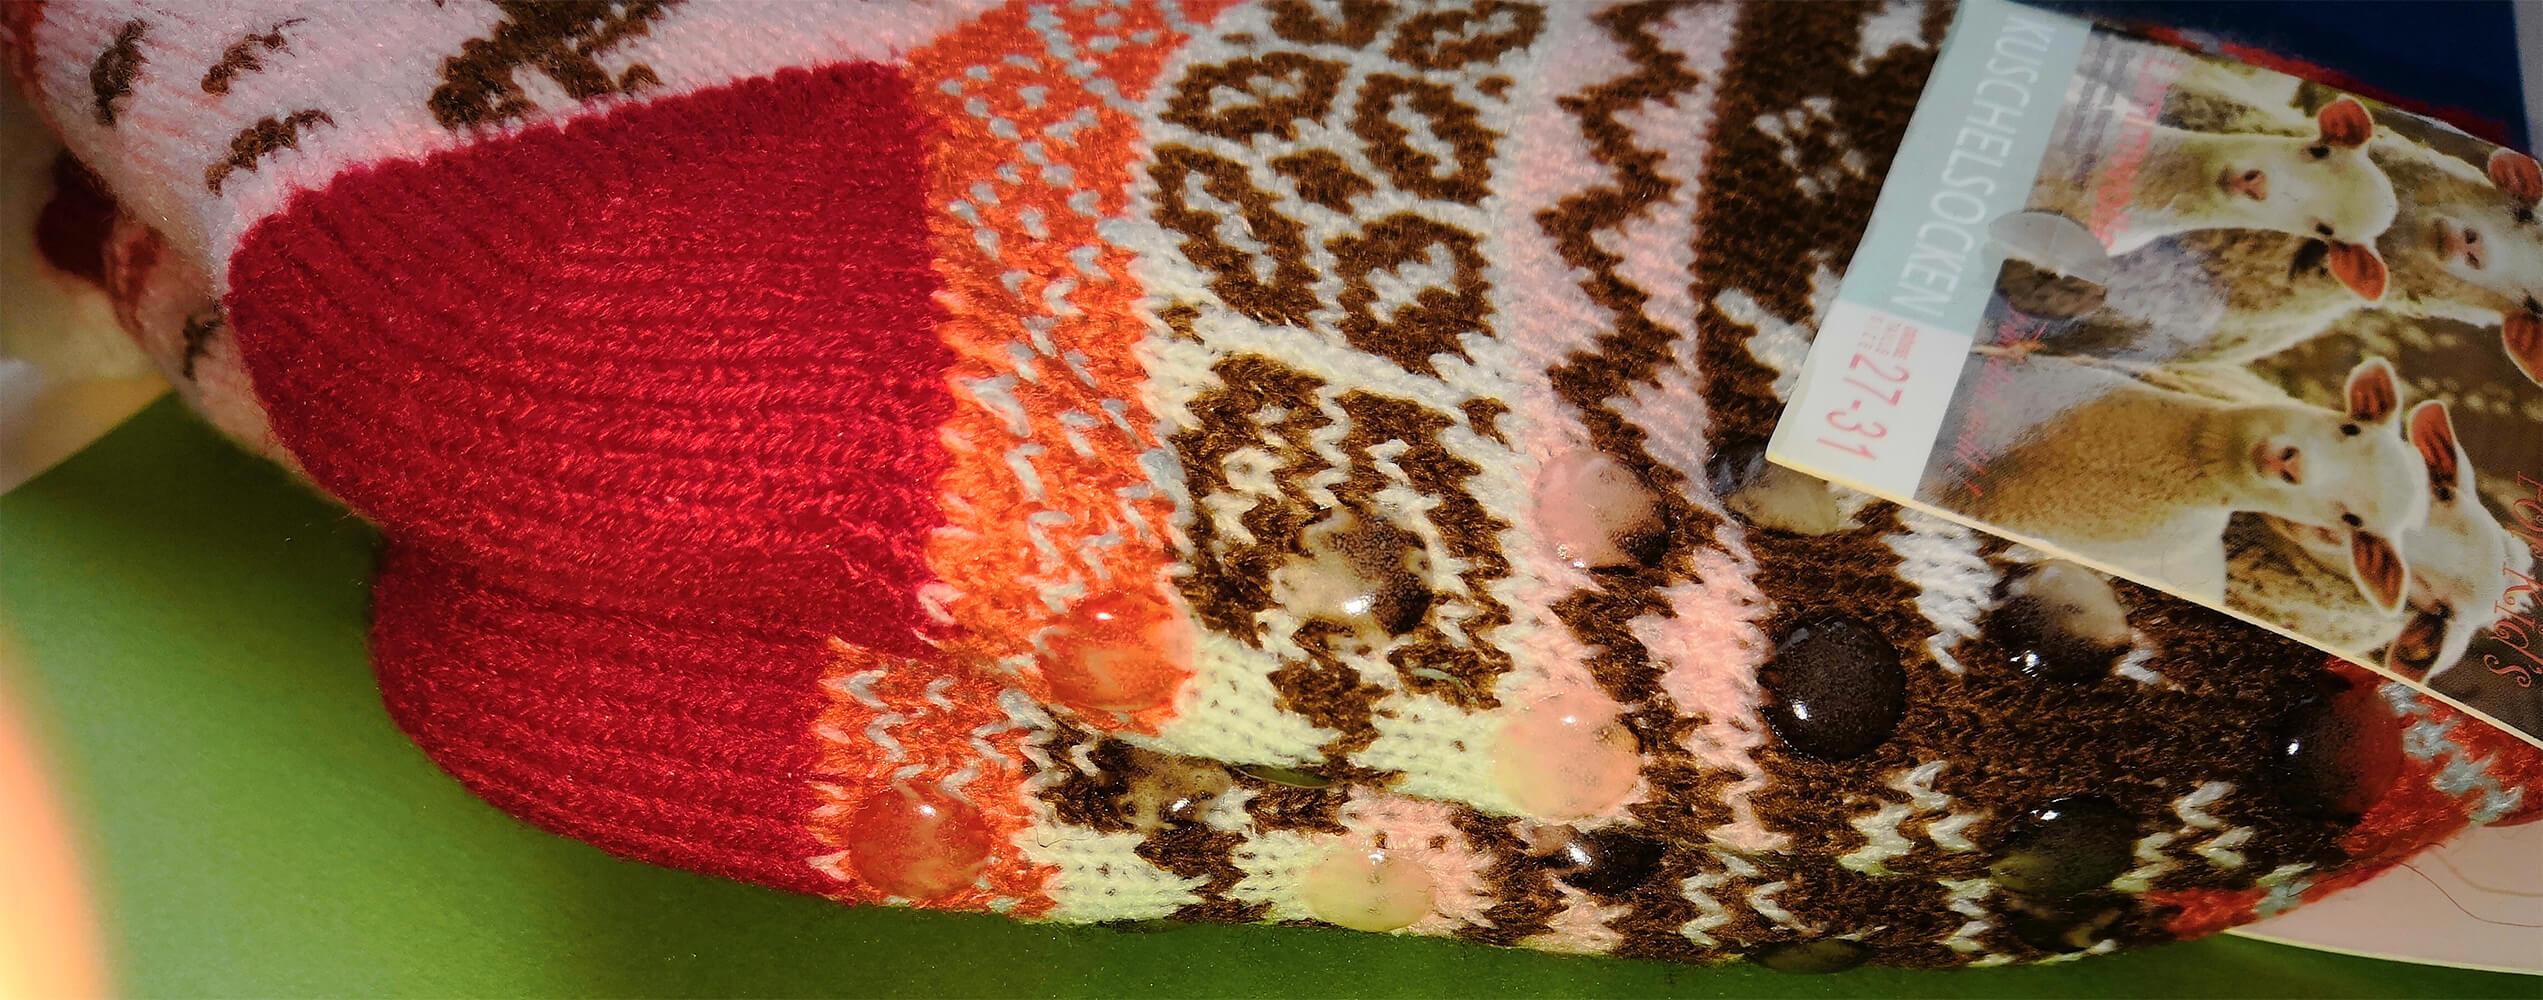 Детские носки-тапочки Emi Ross EJ-6208-r красного цвета. 32-35 размера. Фото 3